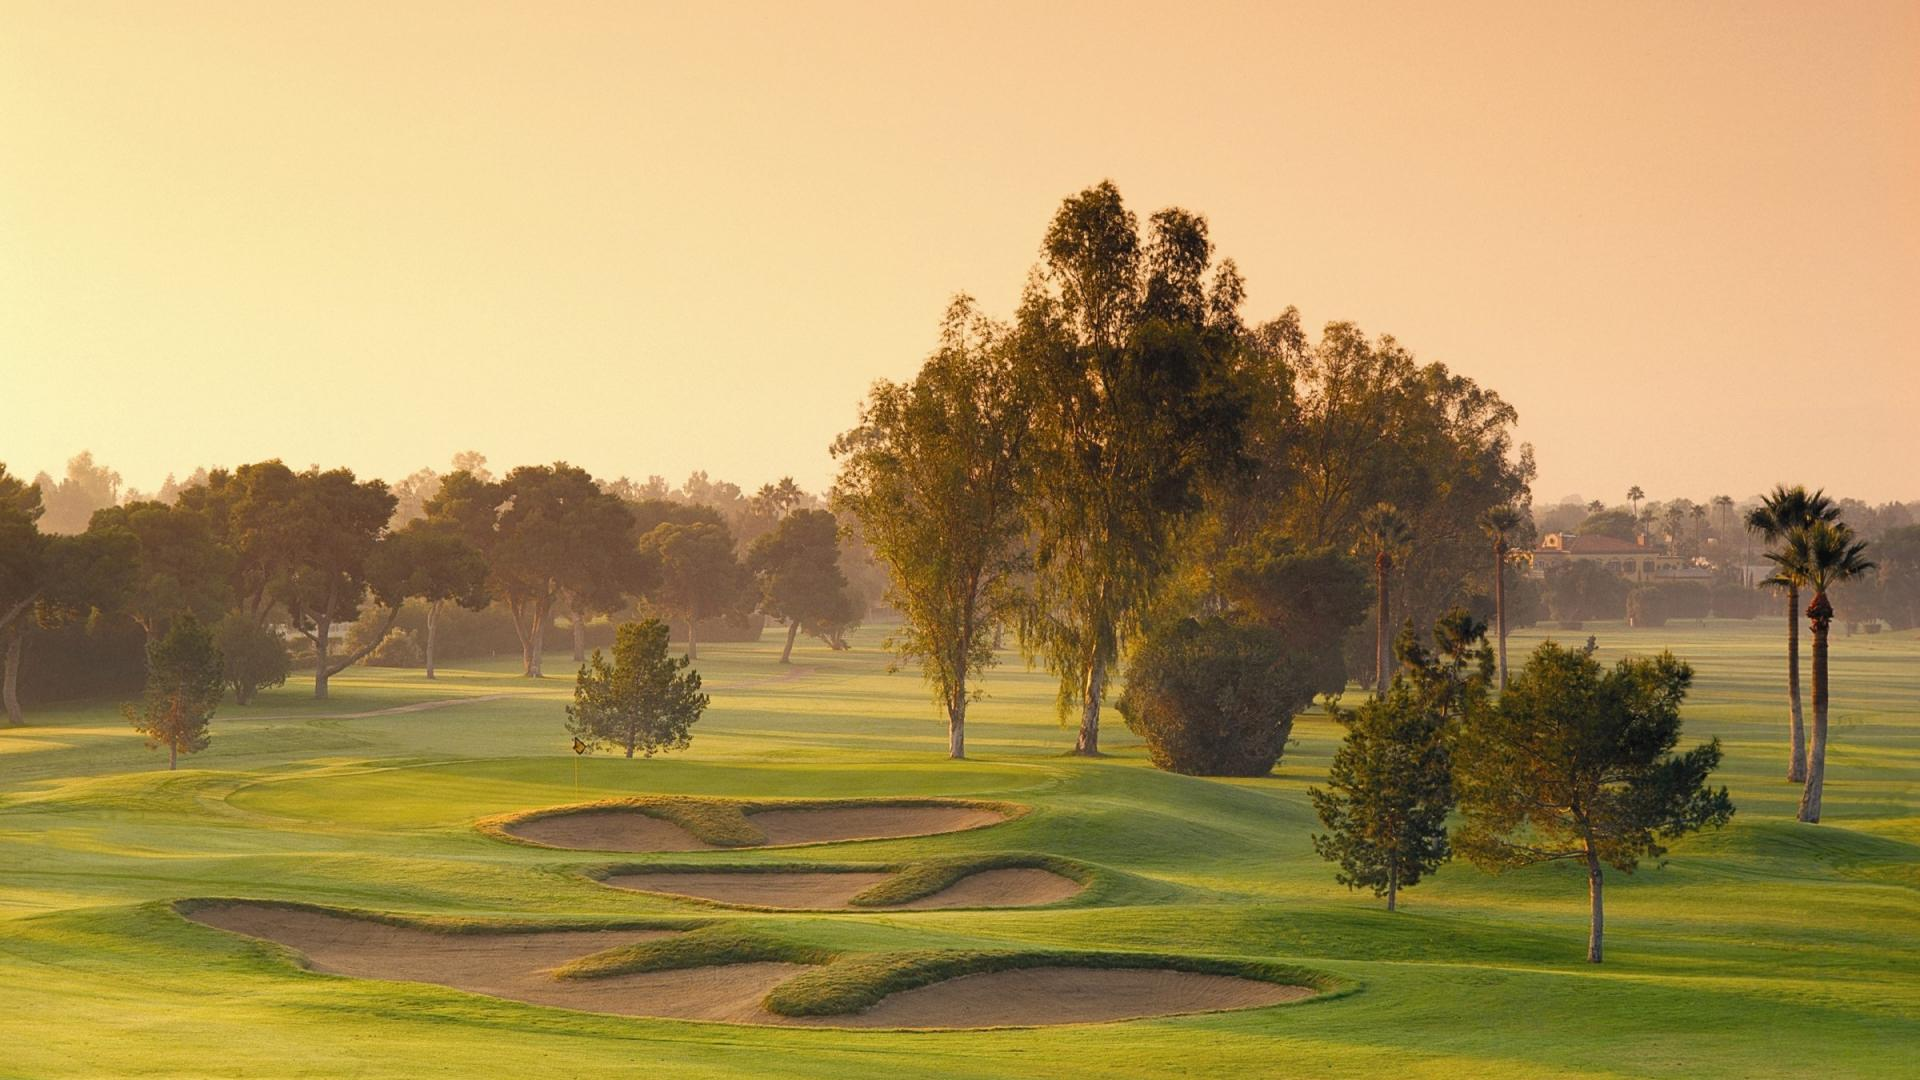 Download Jumeirah Golf Estates 1920x1080 HD Wallpaper | Composite ...